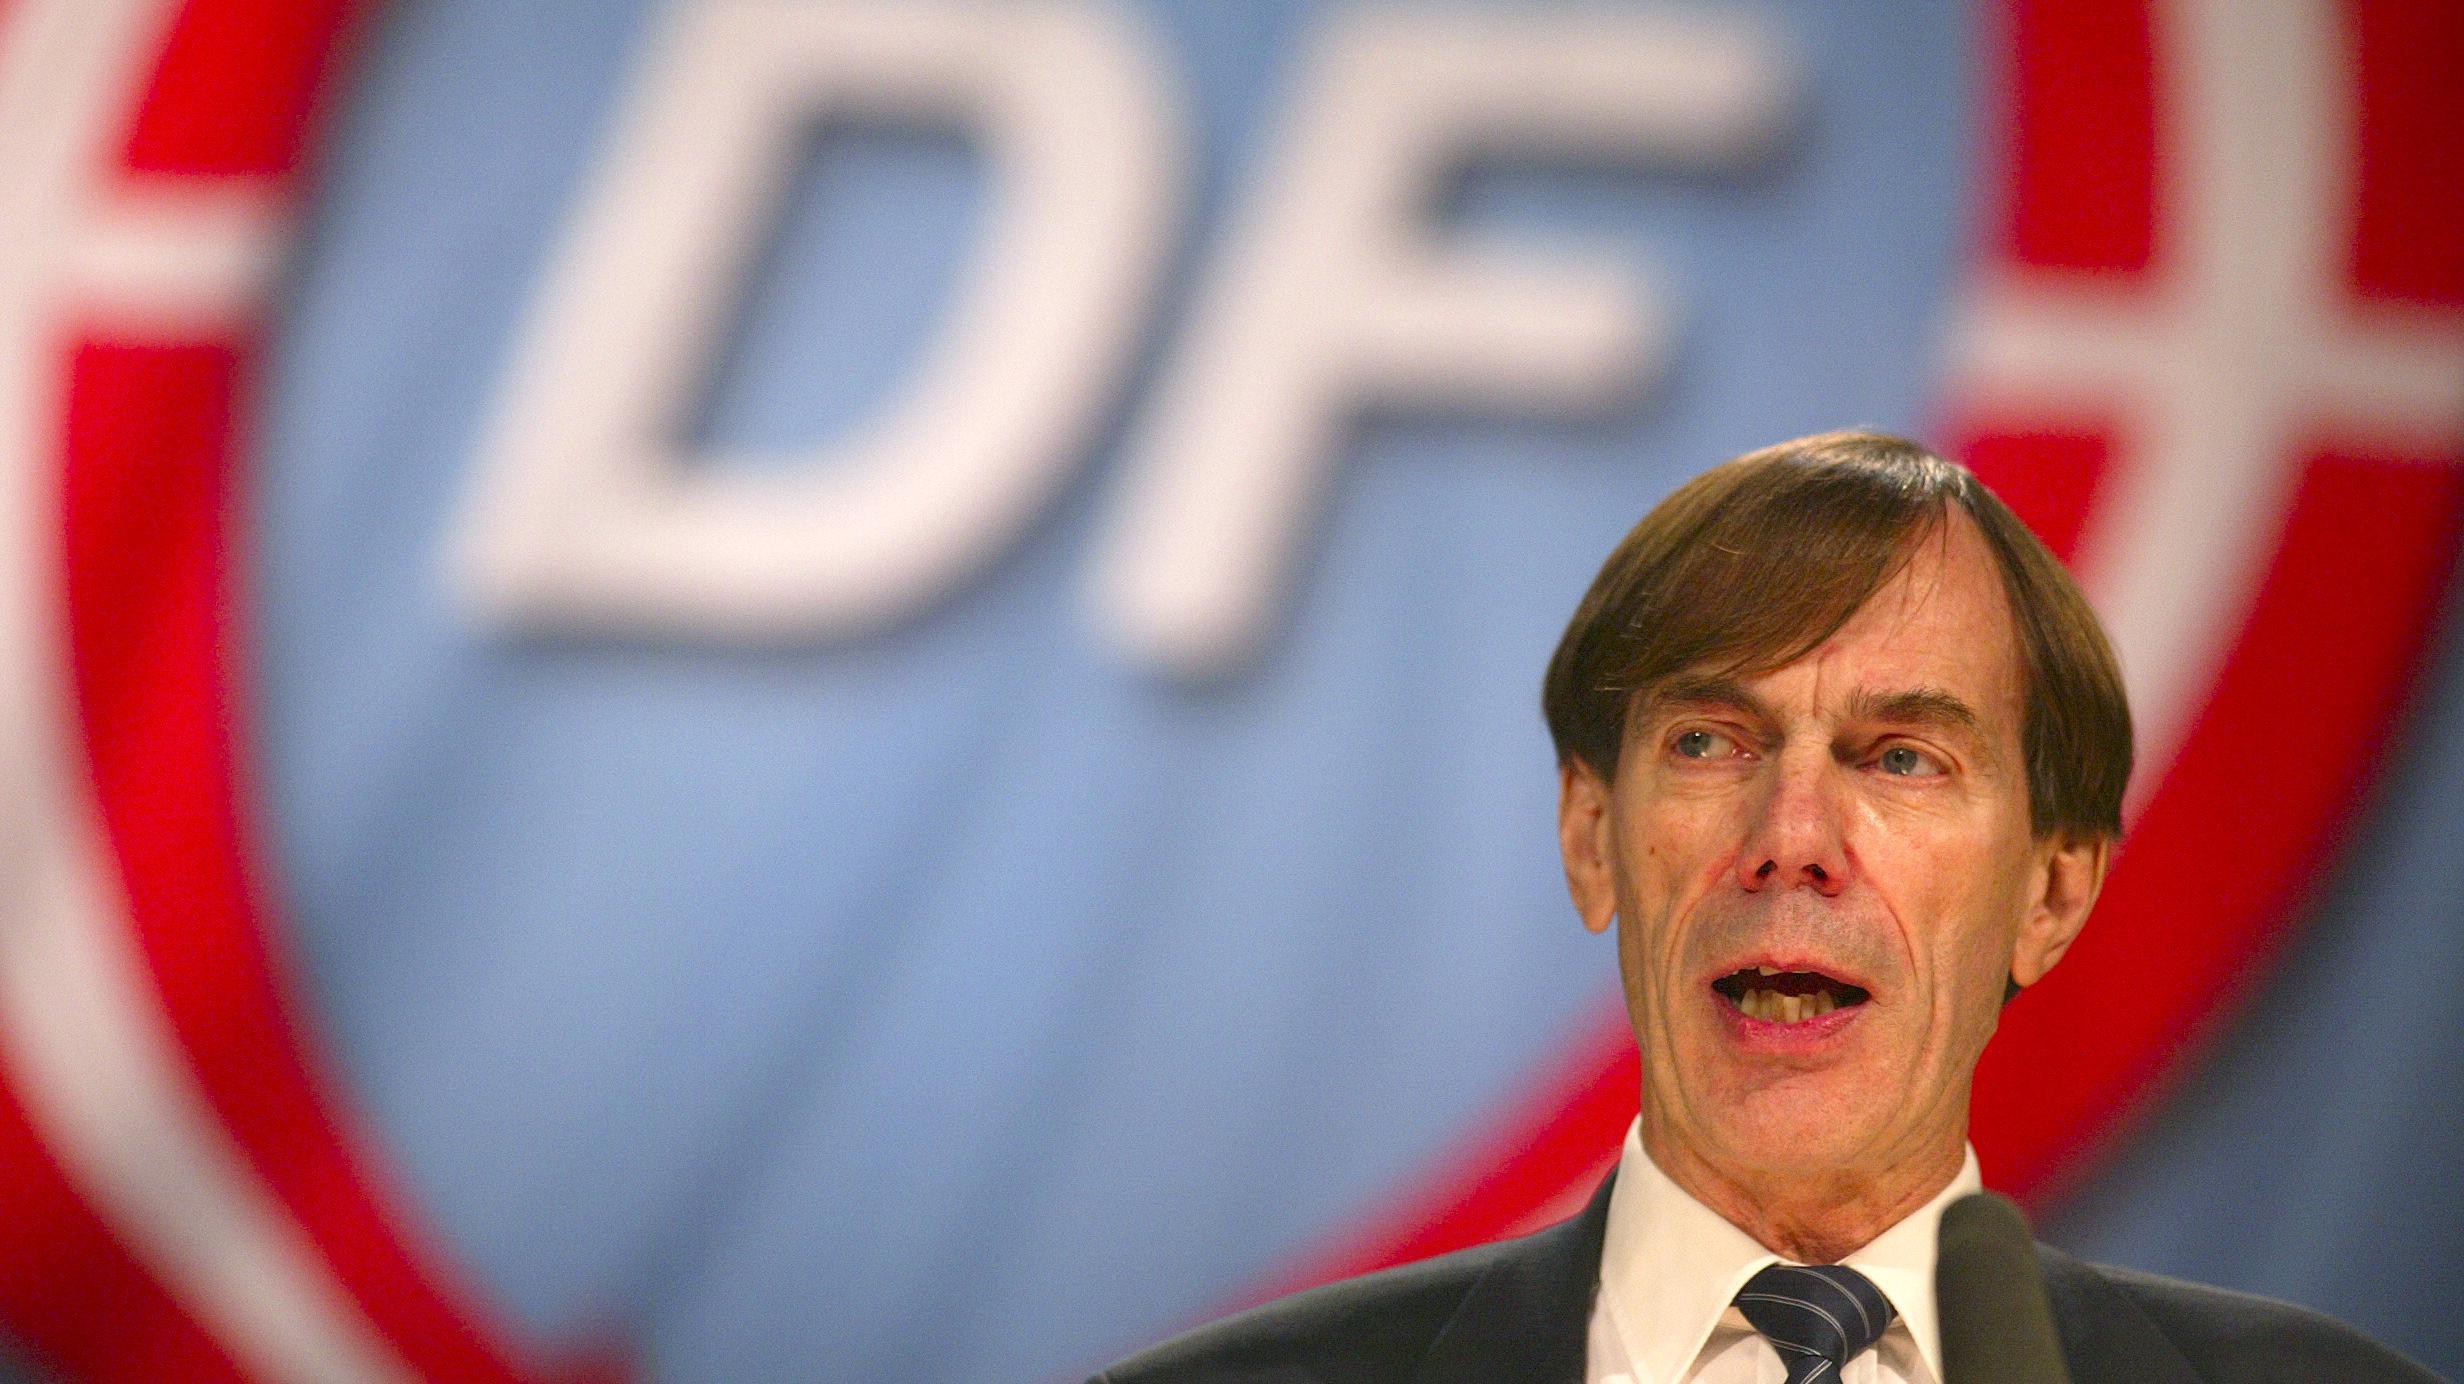 gradis prono nyt dansk parti